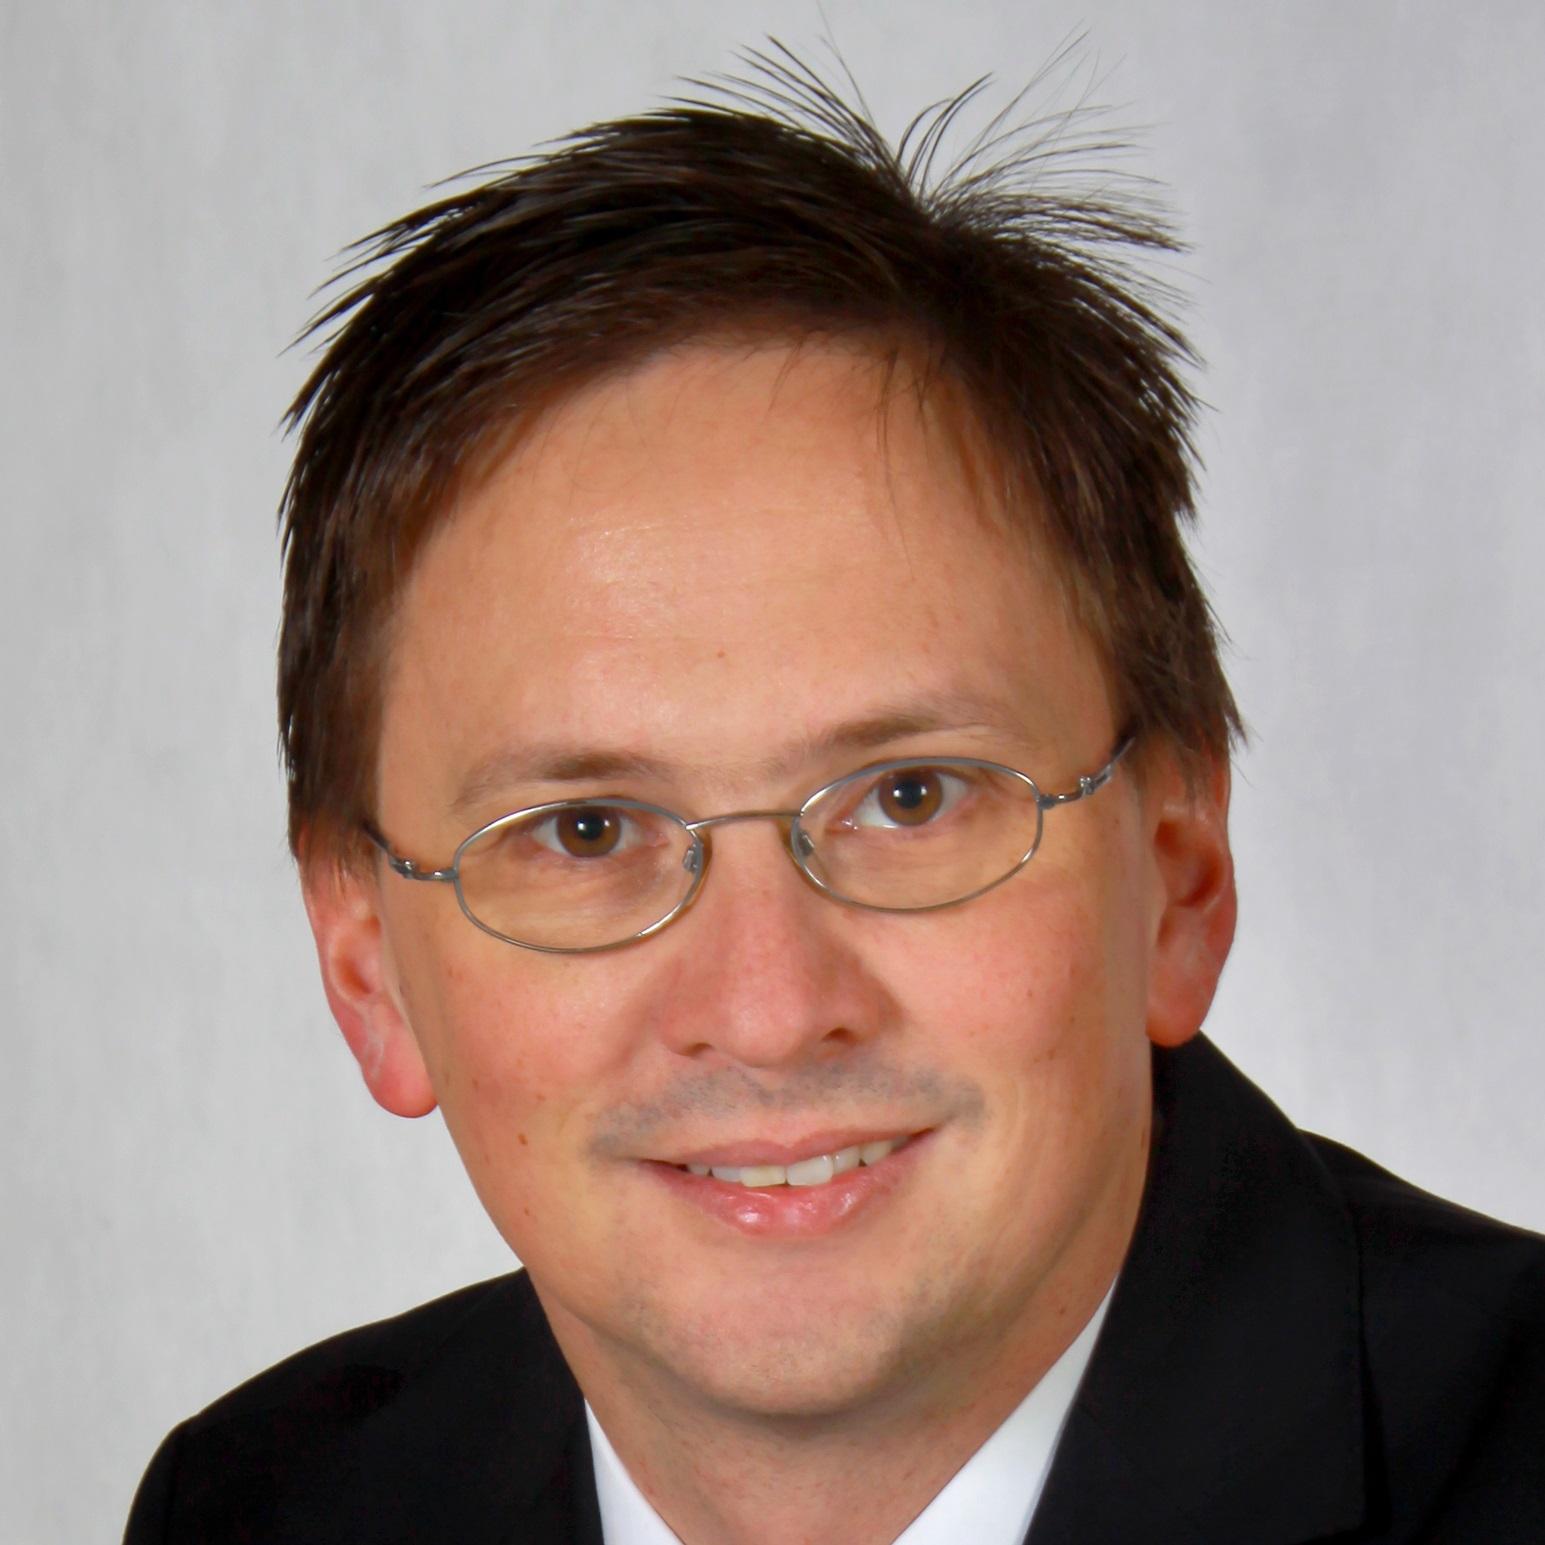 Thomas Ohlemacher